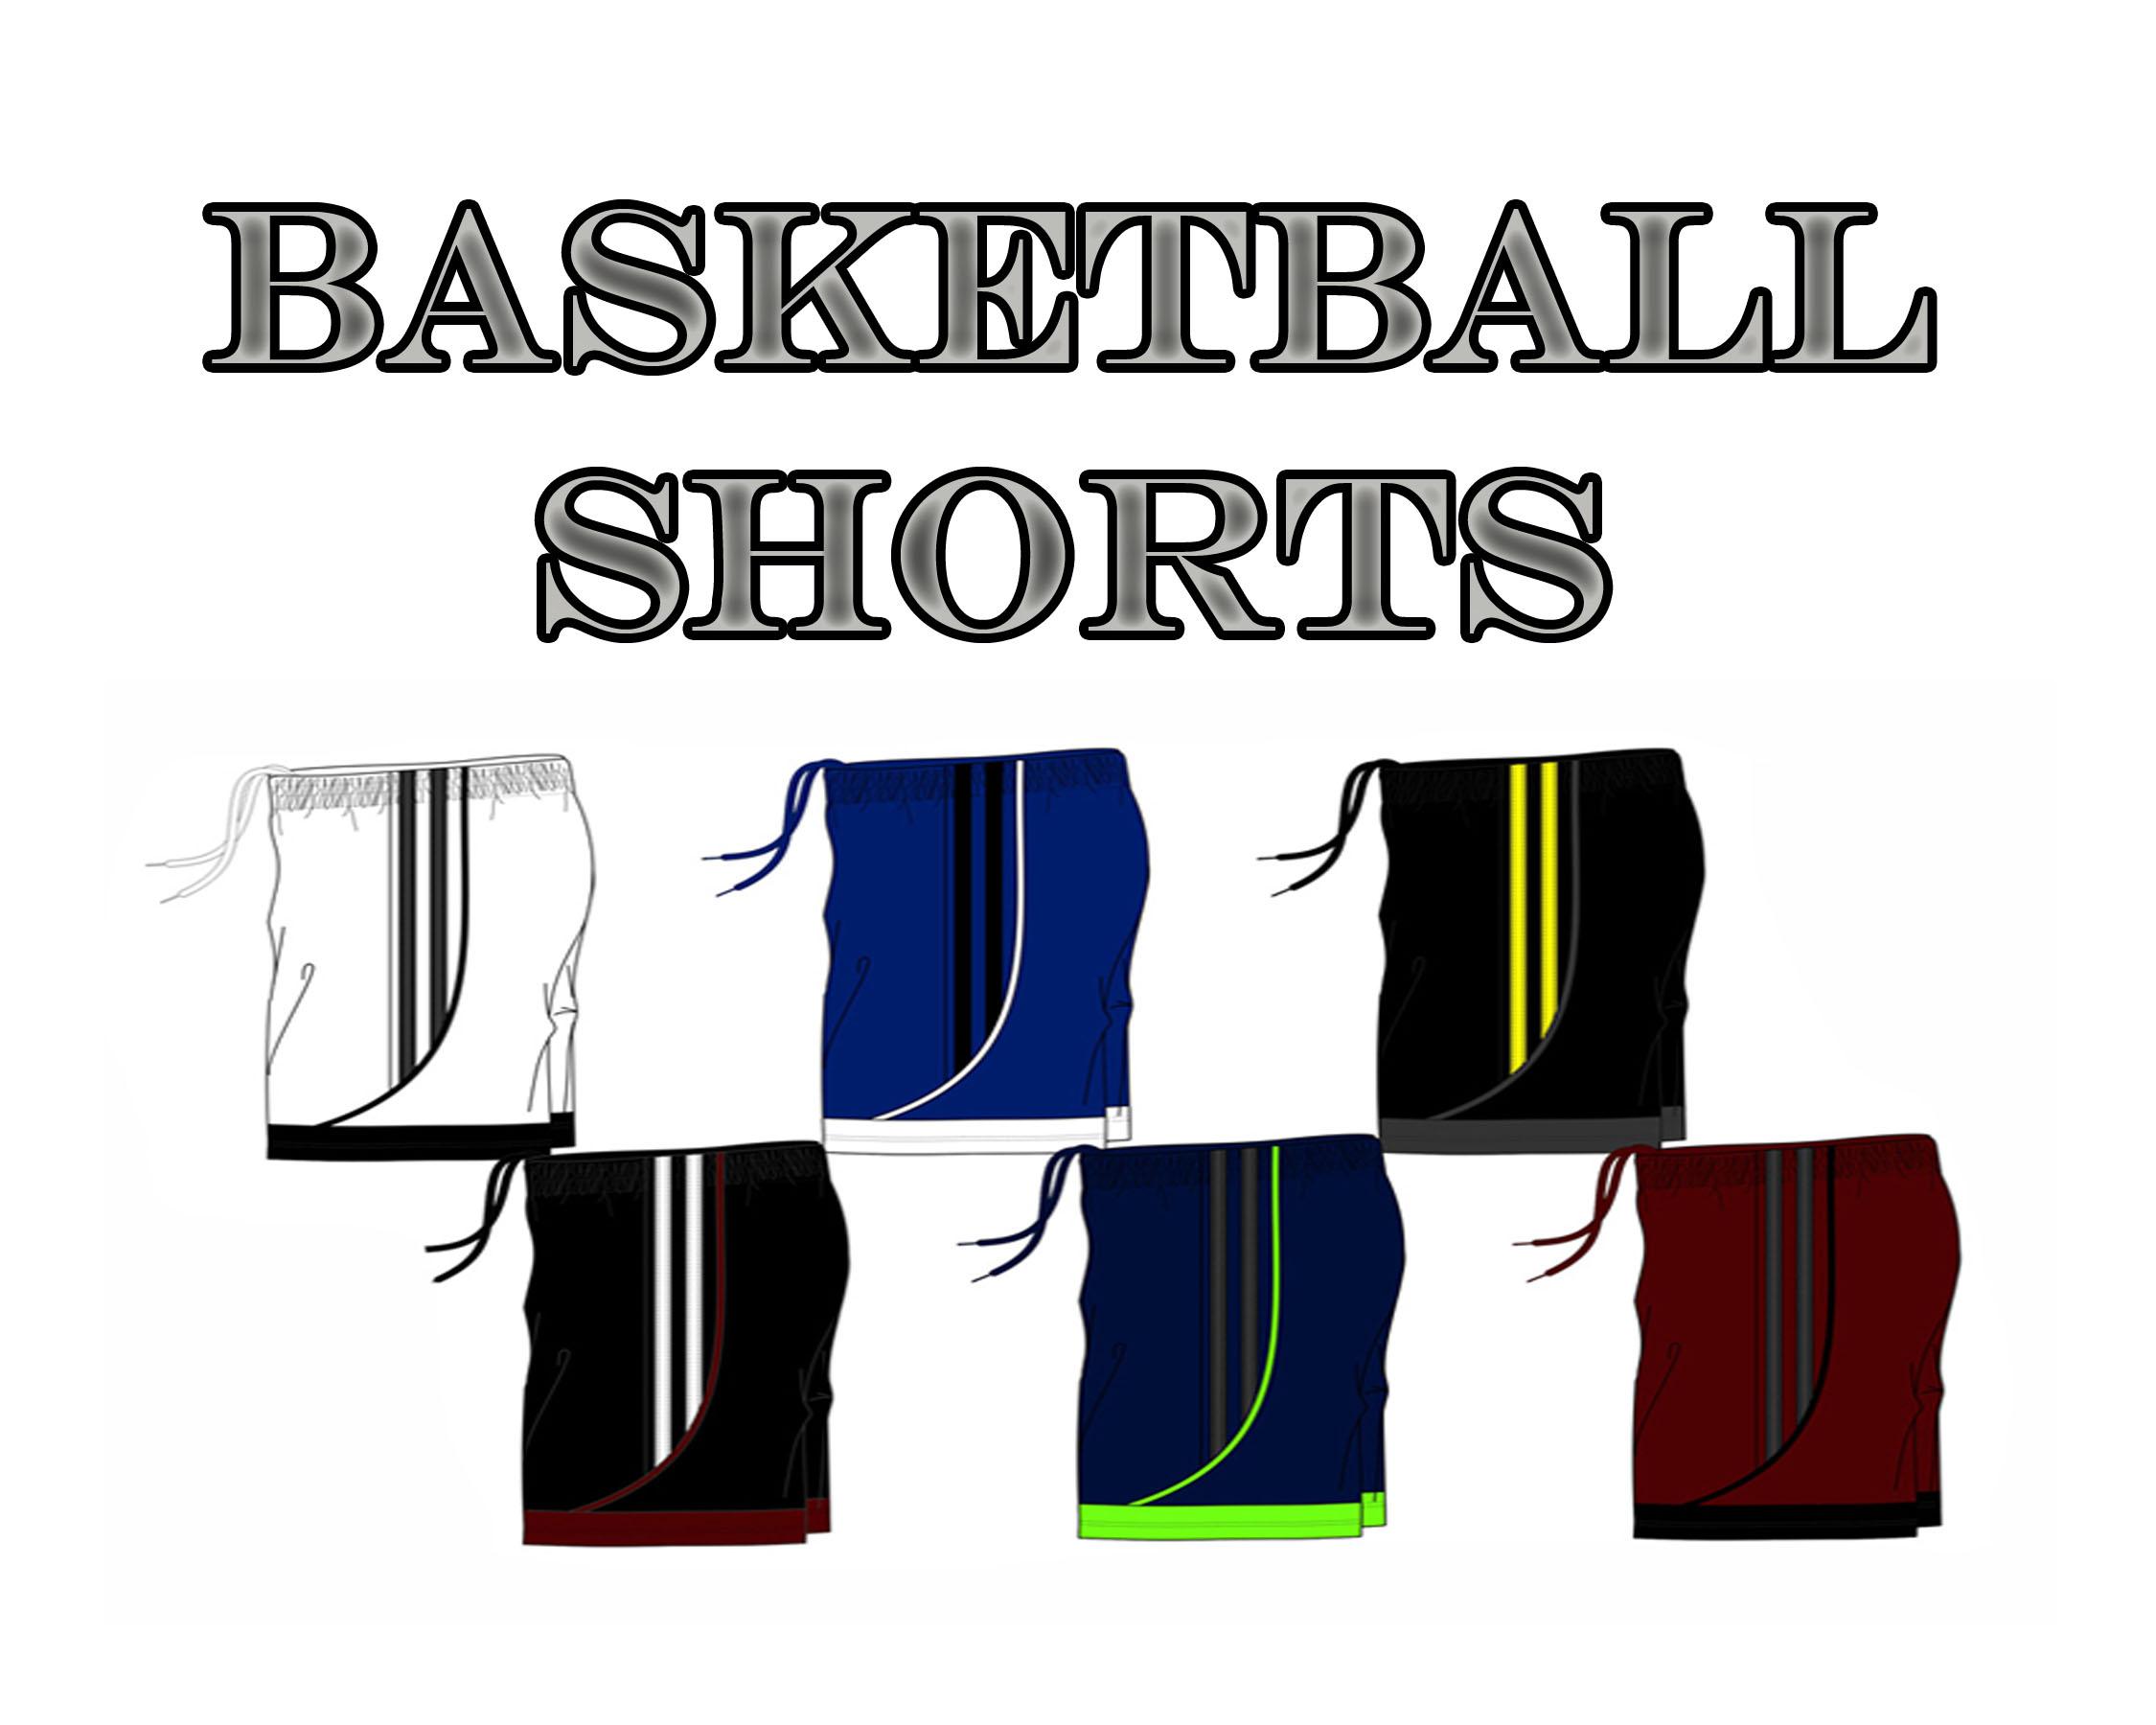 webpage-baseball-shorts-arrival-banner-box.jpg